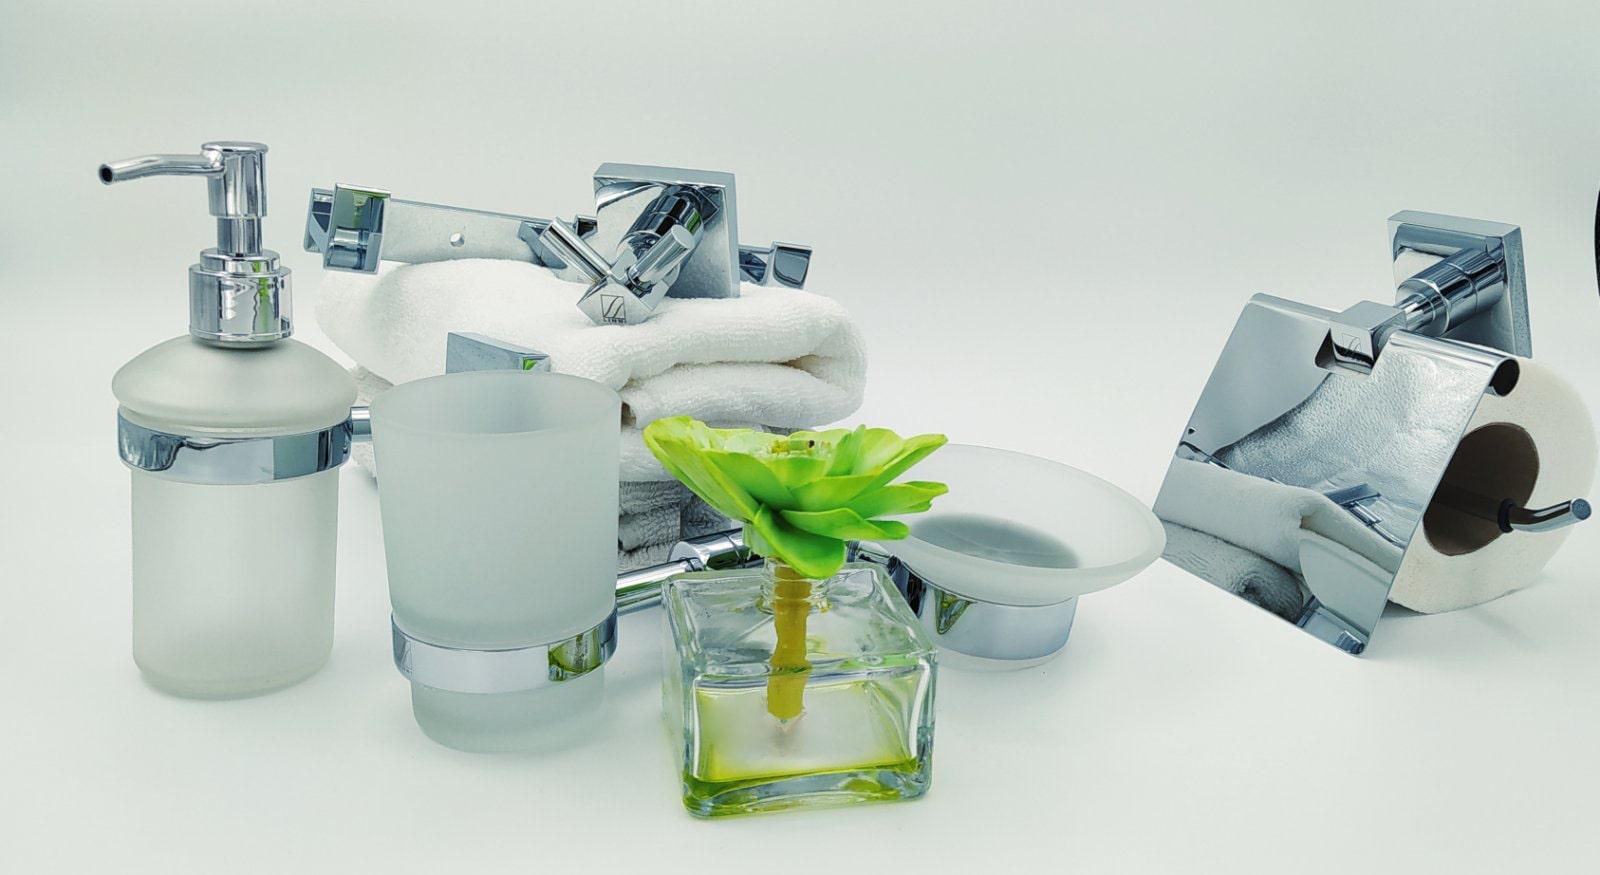 АQУА ПРОМЕТ Д.О.О. Купатила, опрема за купатила, керамика Јагодина